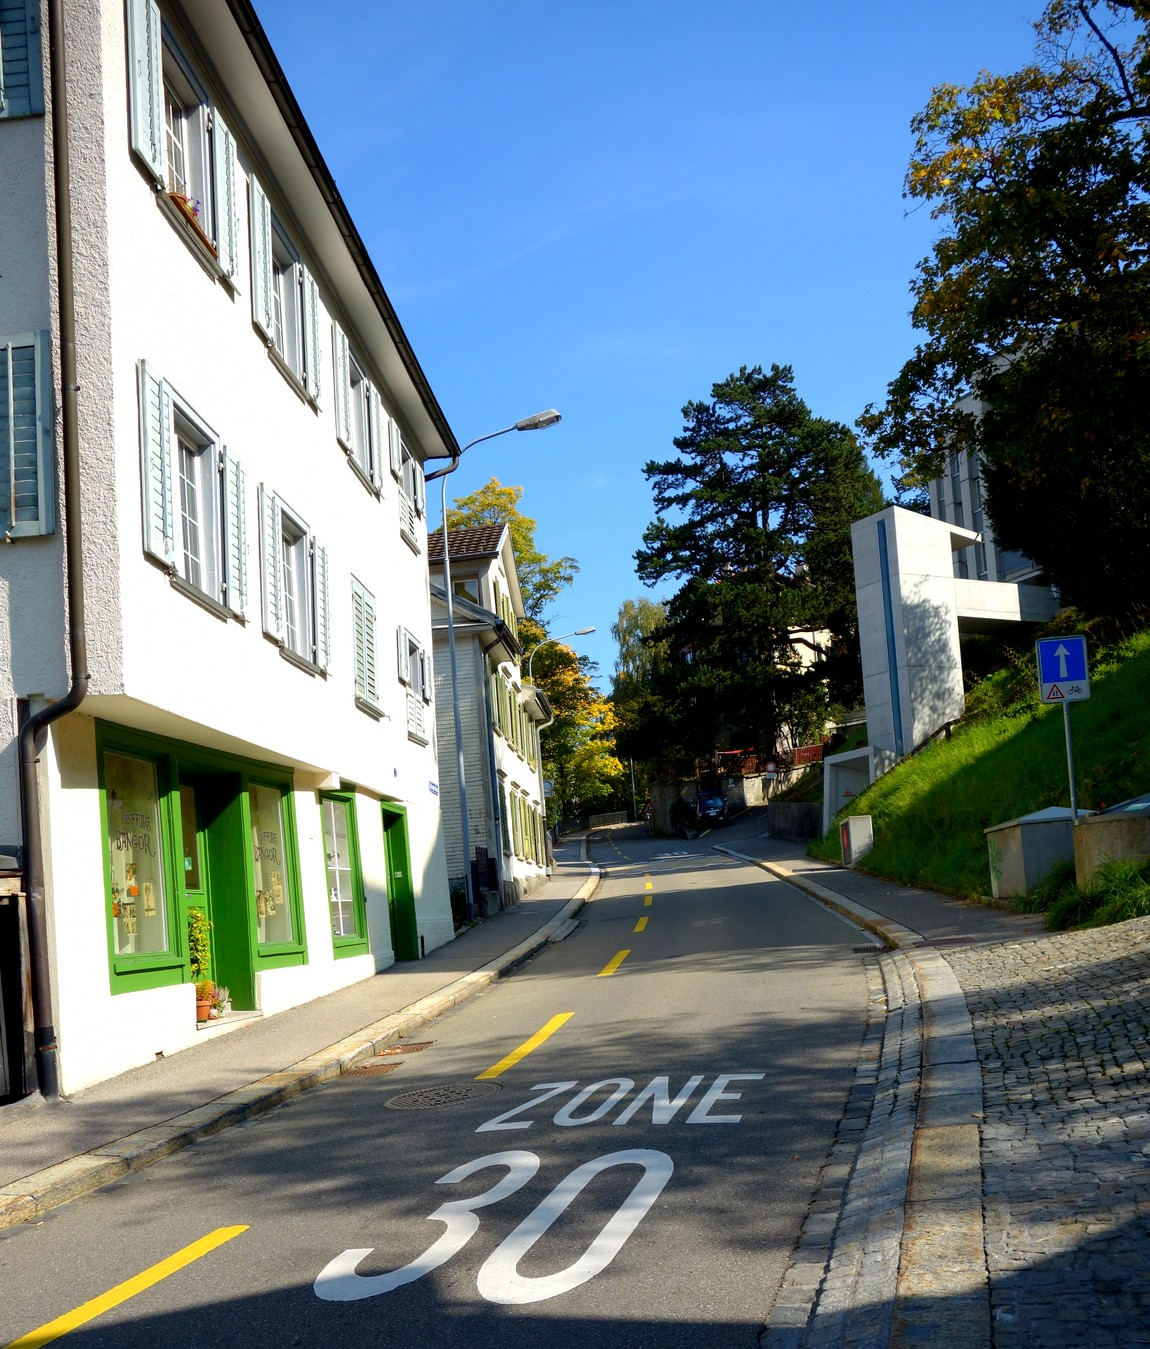 Дорога в Санкт-Галлен (Швейцария)